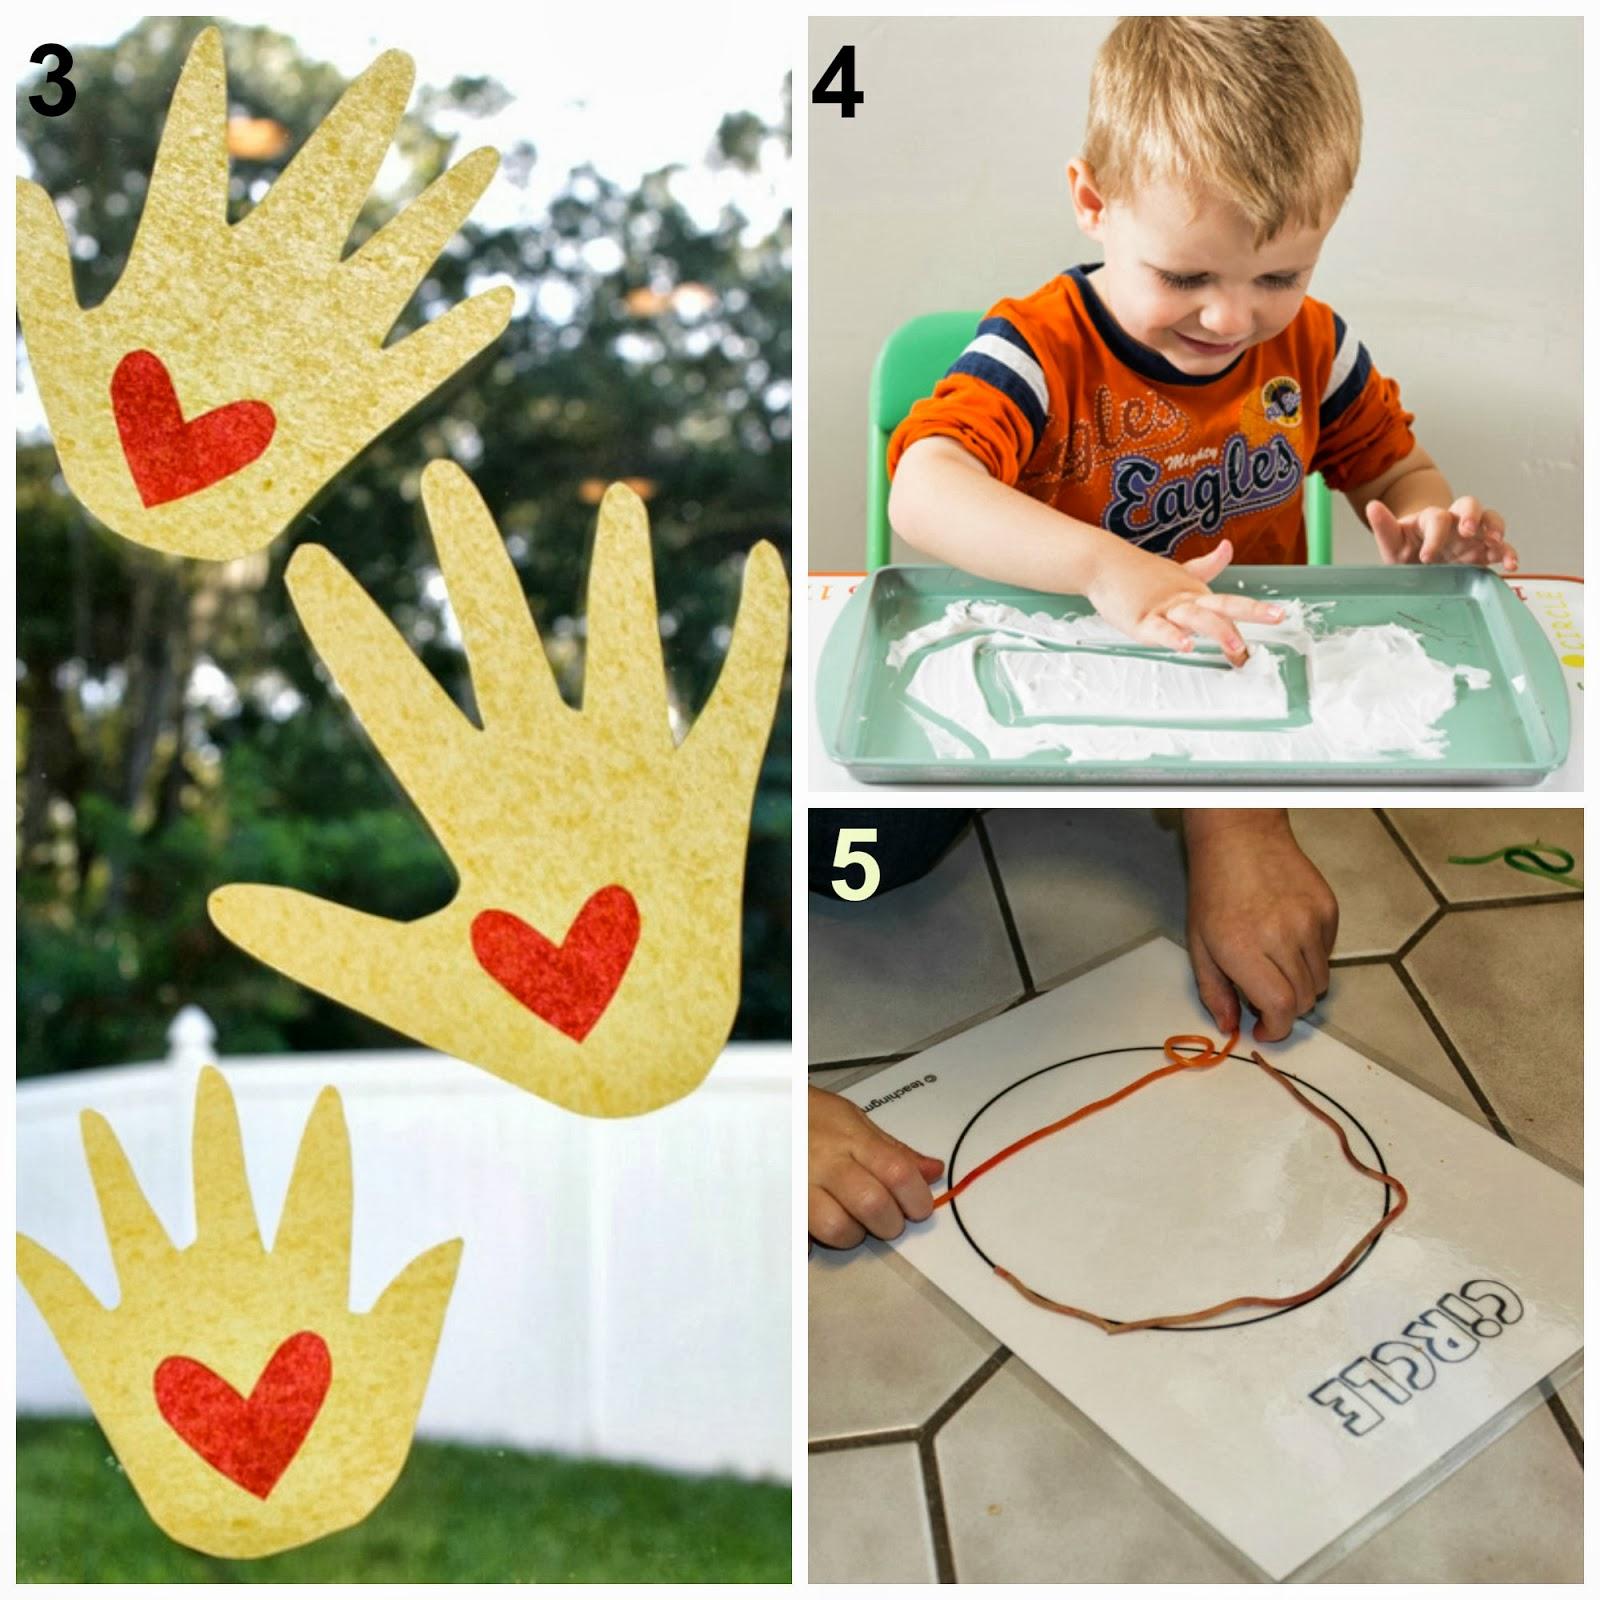 Share It Saturday 10 Educational And Creative Preschool Activities 3